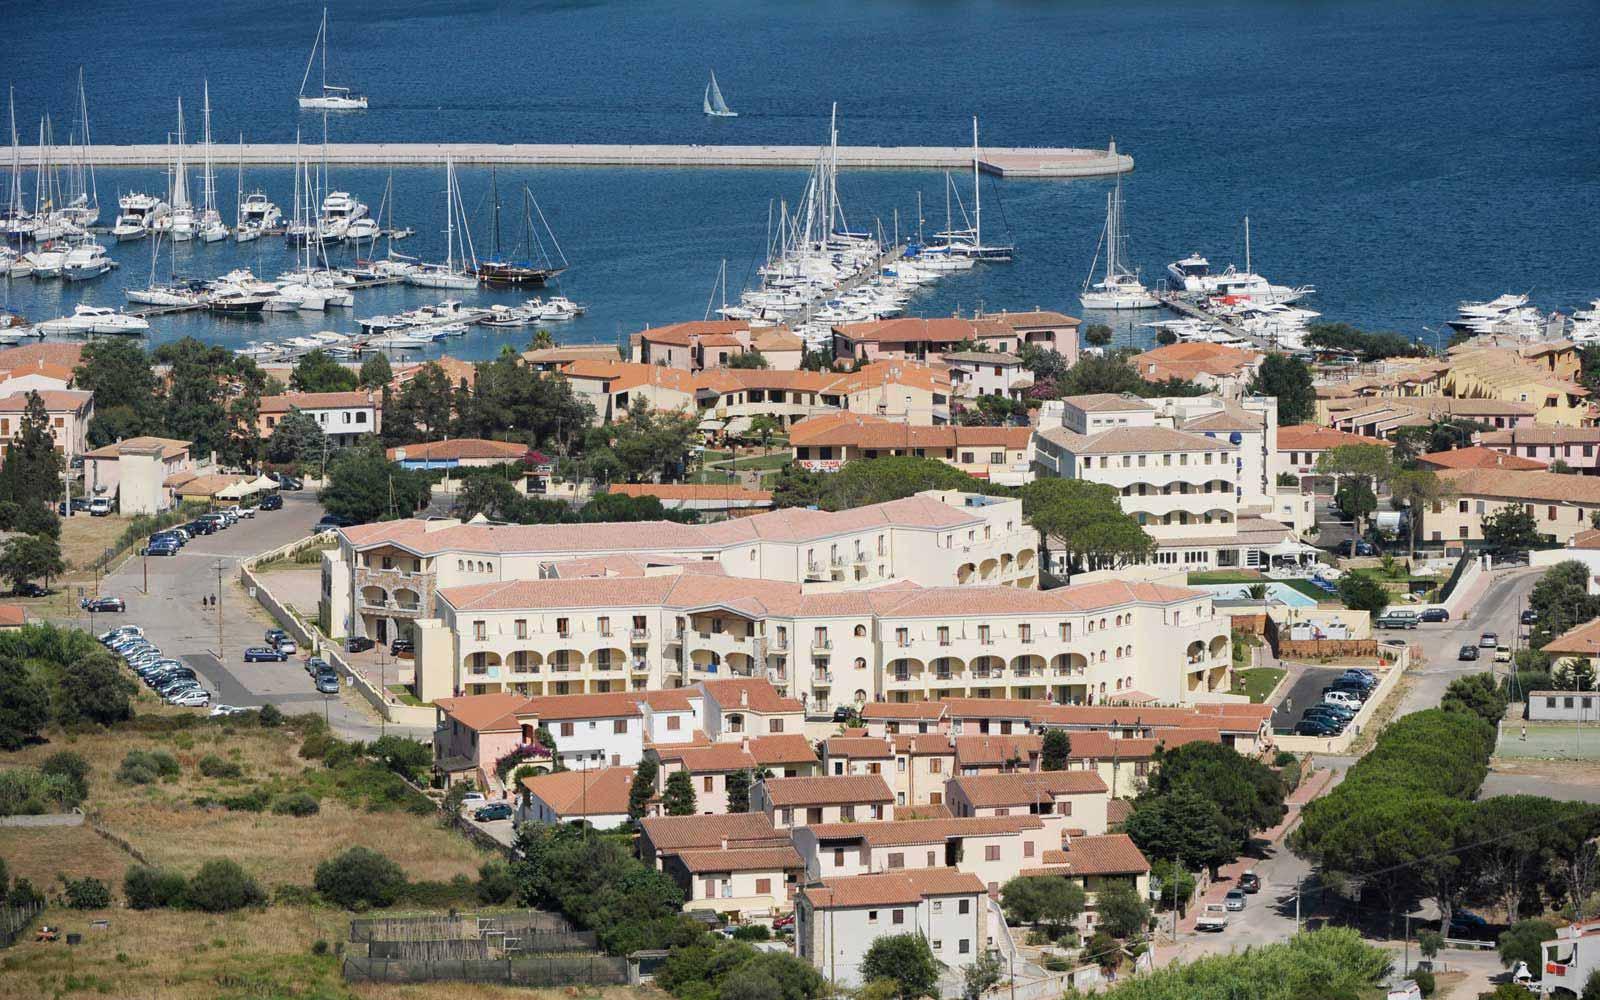 Panoramic view at Blu Hotel Morisco